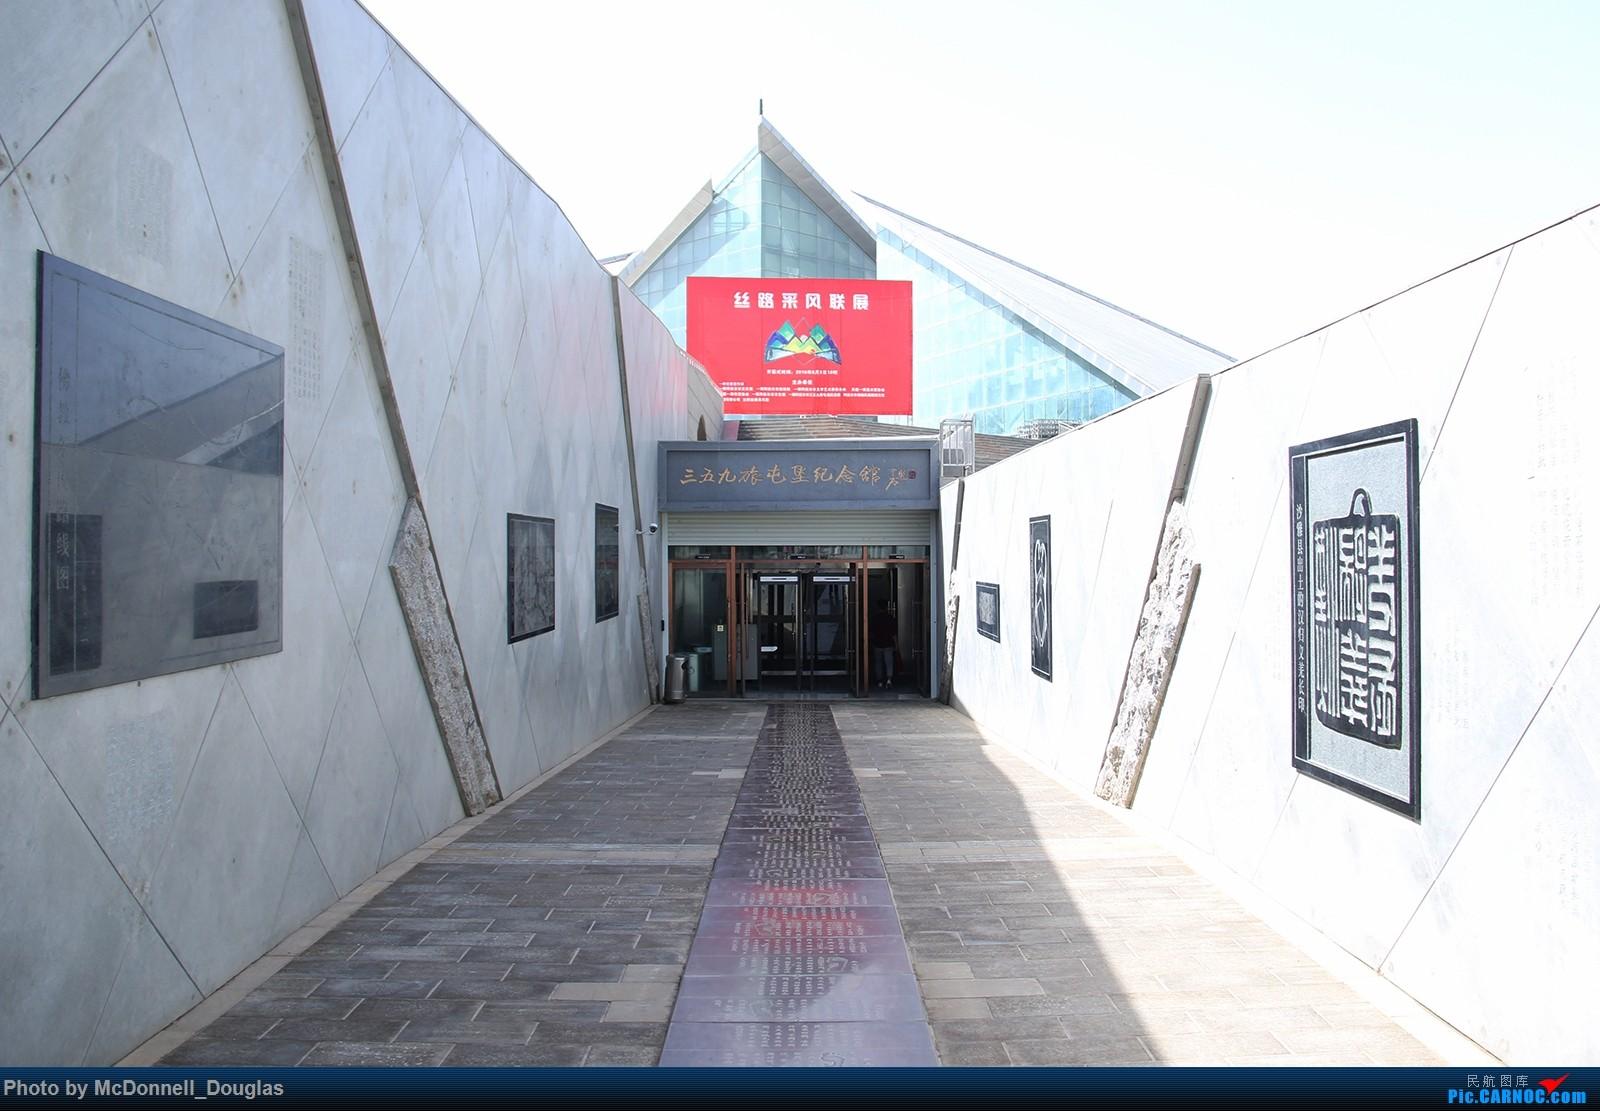 Re:[原创]【上海飞友会】【zc带你走天下(2)】再访祖辈年轻时工作的土地,父母年少时生活戈壁,跨越大半个中国去看新疆,回程小游蓉城(上) AIRBUS A330-343 B-6120 中国上海虹桥国际机场